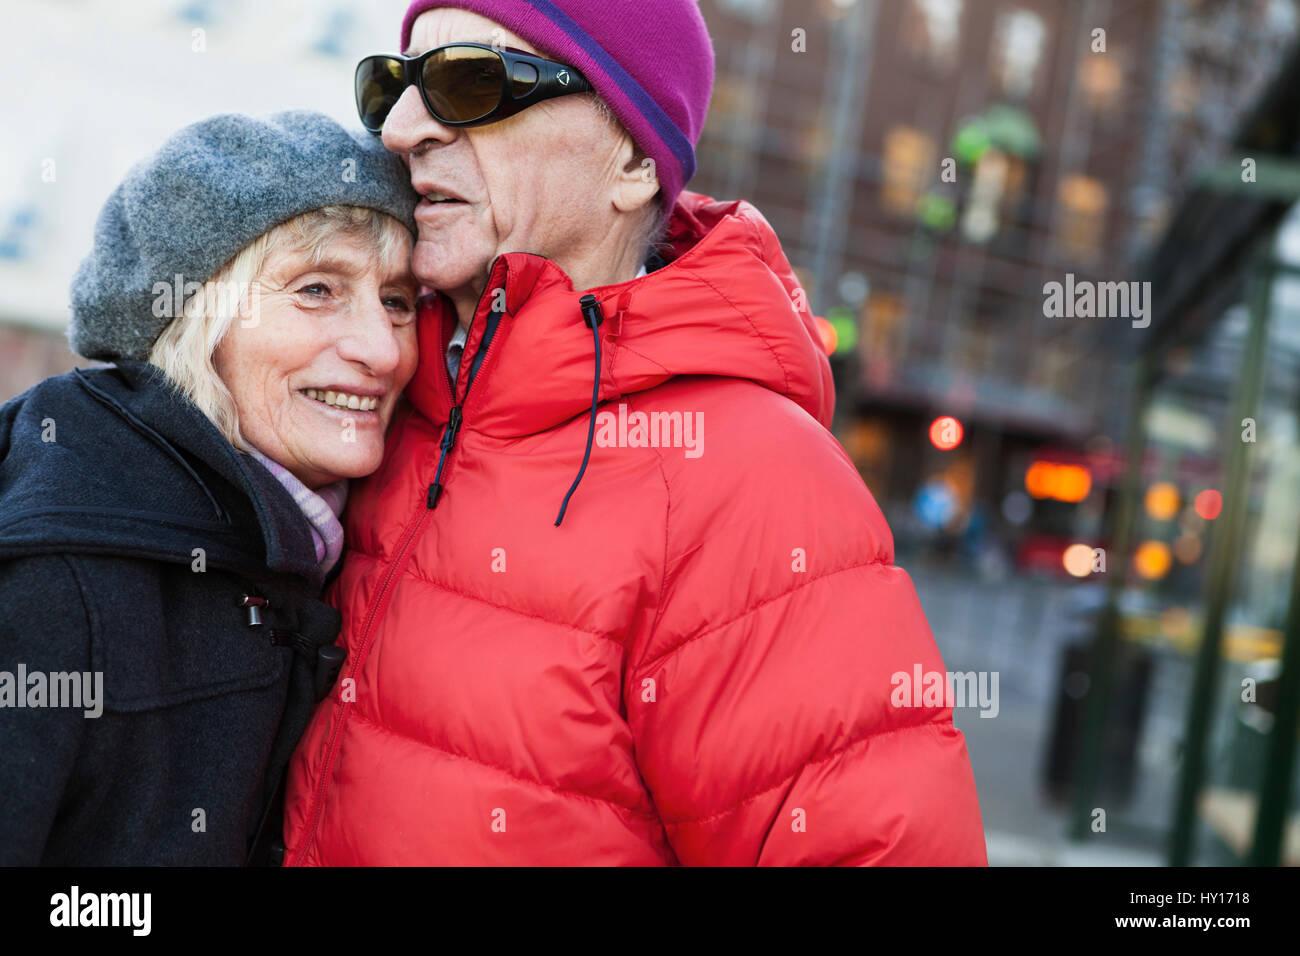 La Suède, Stockholm, Södermalm, senior couple hugging at bus stop Photo Stock